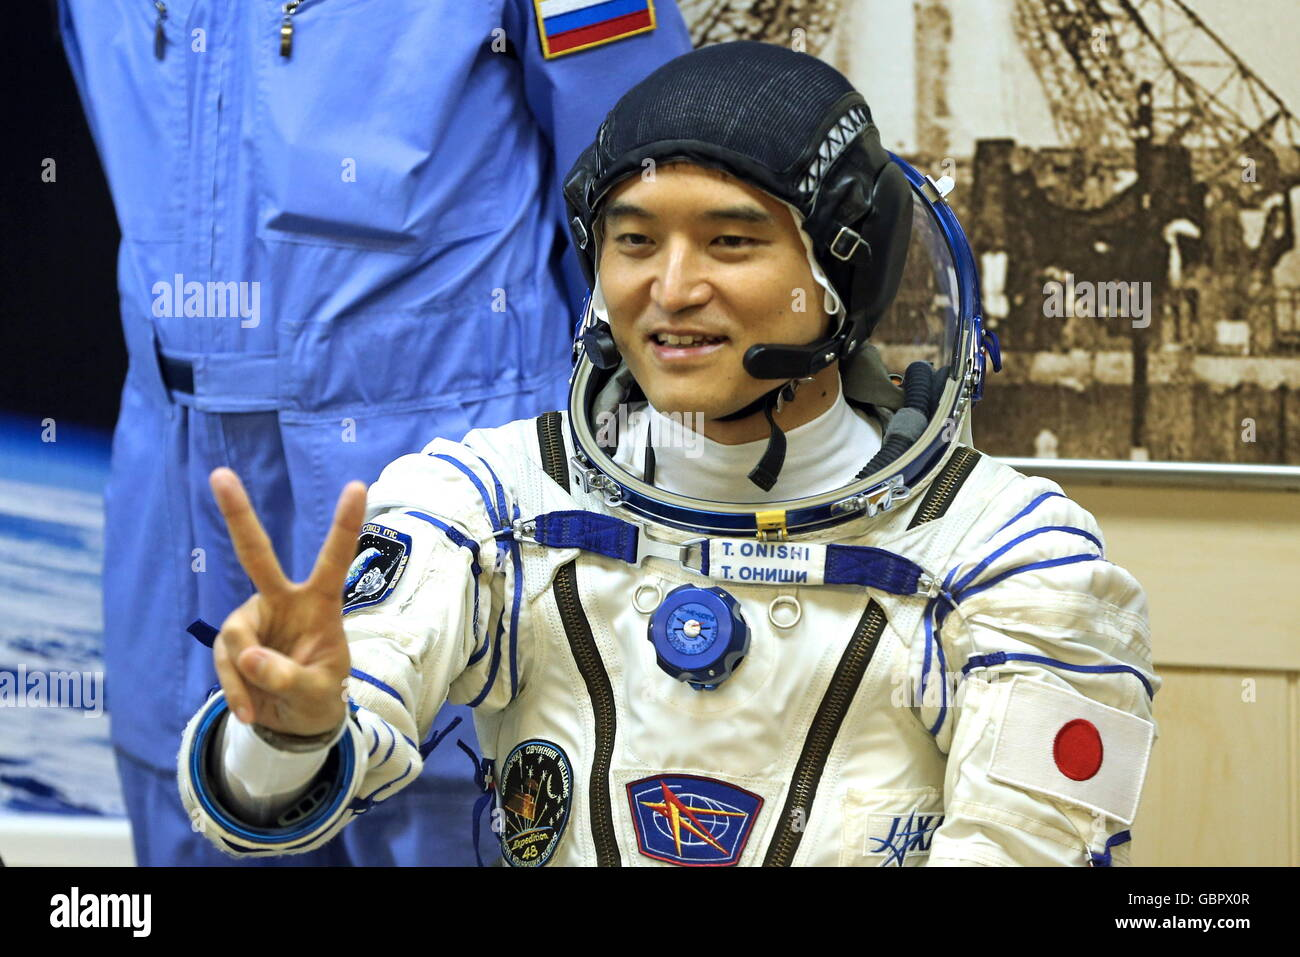 Baikonur Cosmodrome, Kazakhstan. 7th July, 2016. Japanese austronaut Takuya Onishi (JAXA), a member of the main - Stock Image